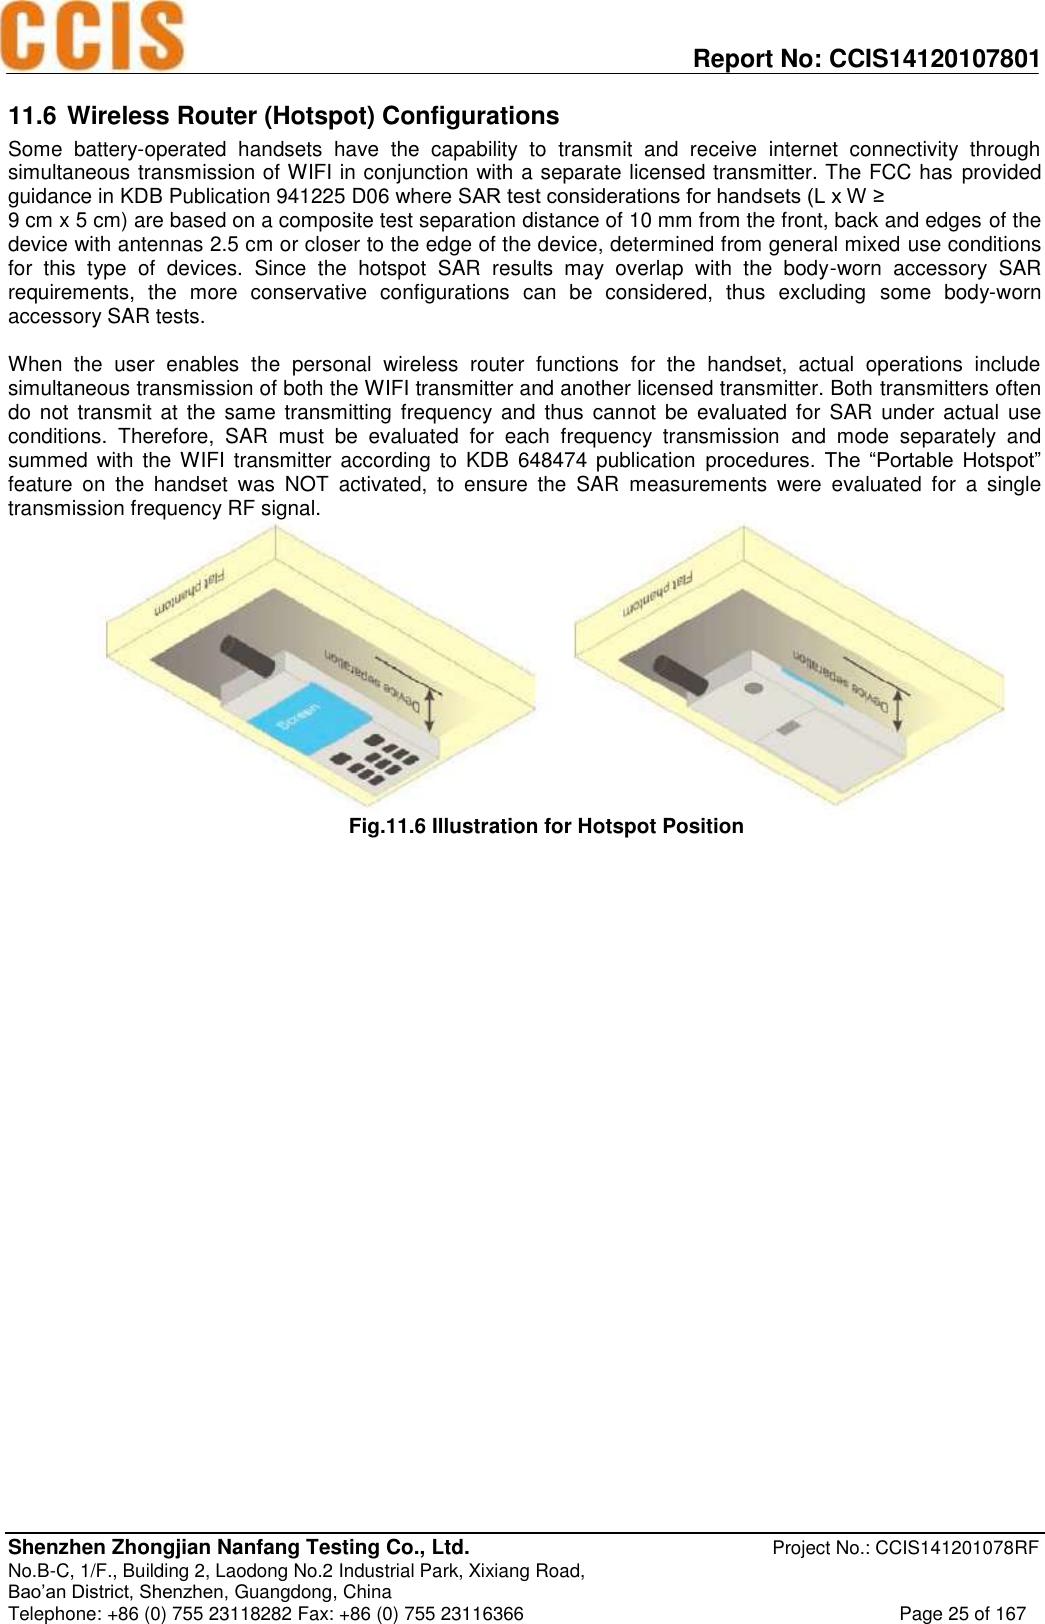 Page 25 of CAPHG28-01 Smart phone-BOOK II series RF Exposure Info HD - Phone Book PNG HD